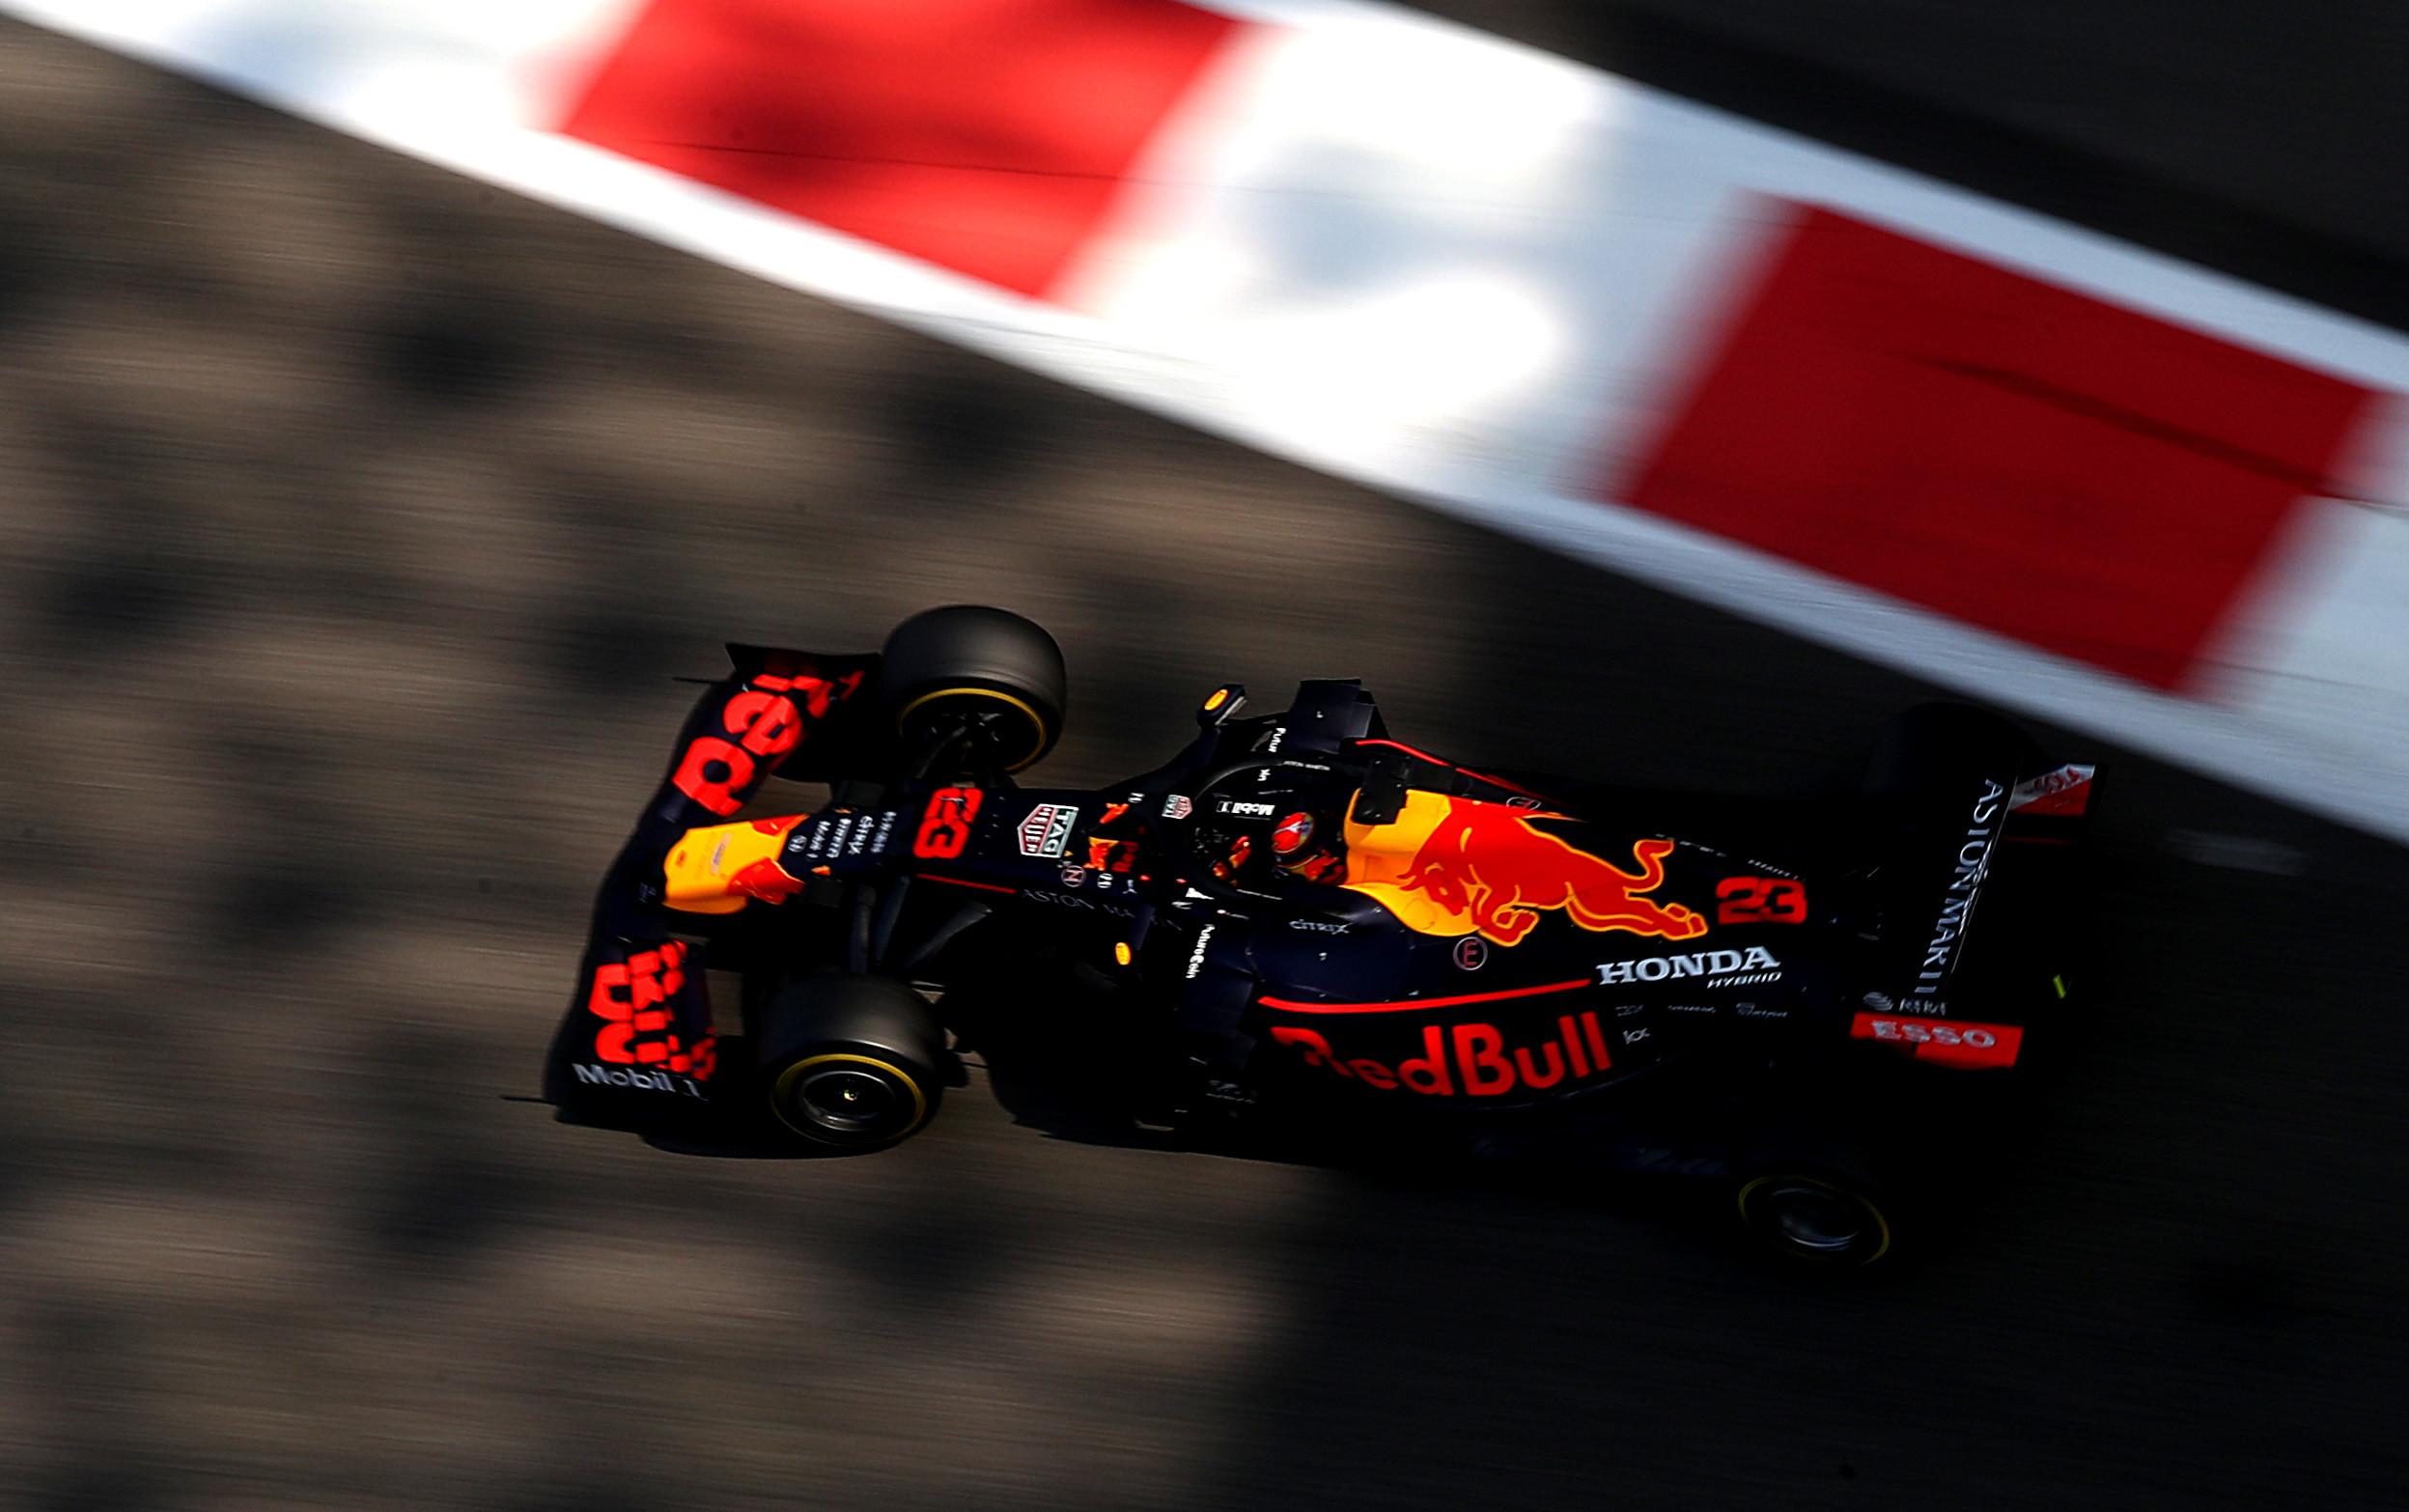 3) Red Bull (640 milioni di dollari di valore; 327 milioni di dollari di ricavo)